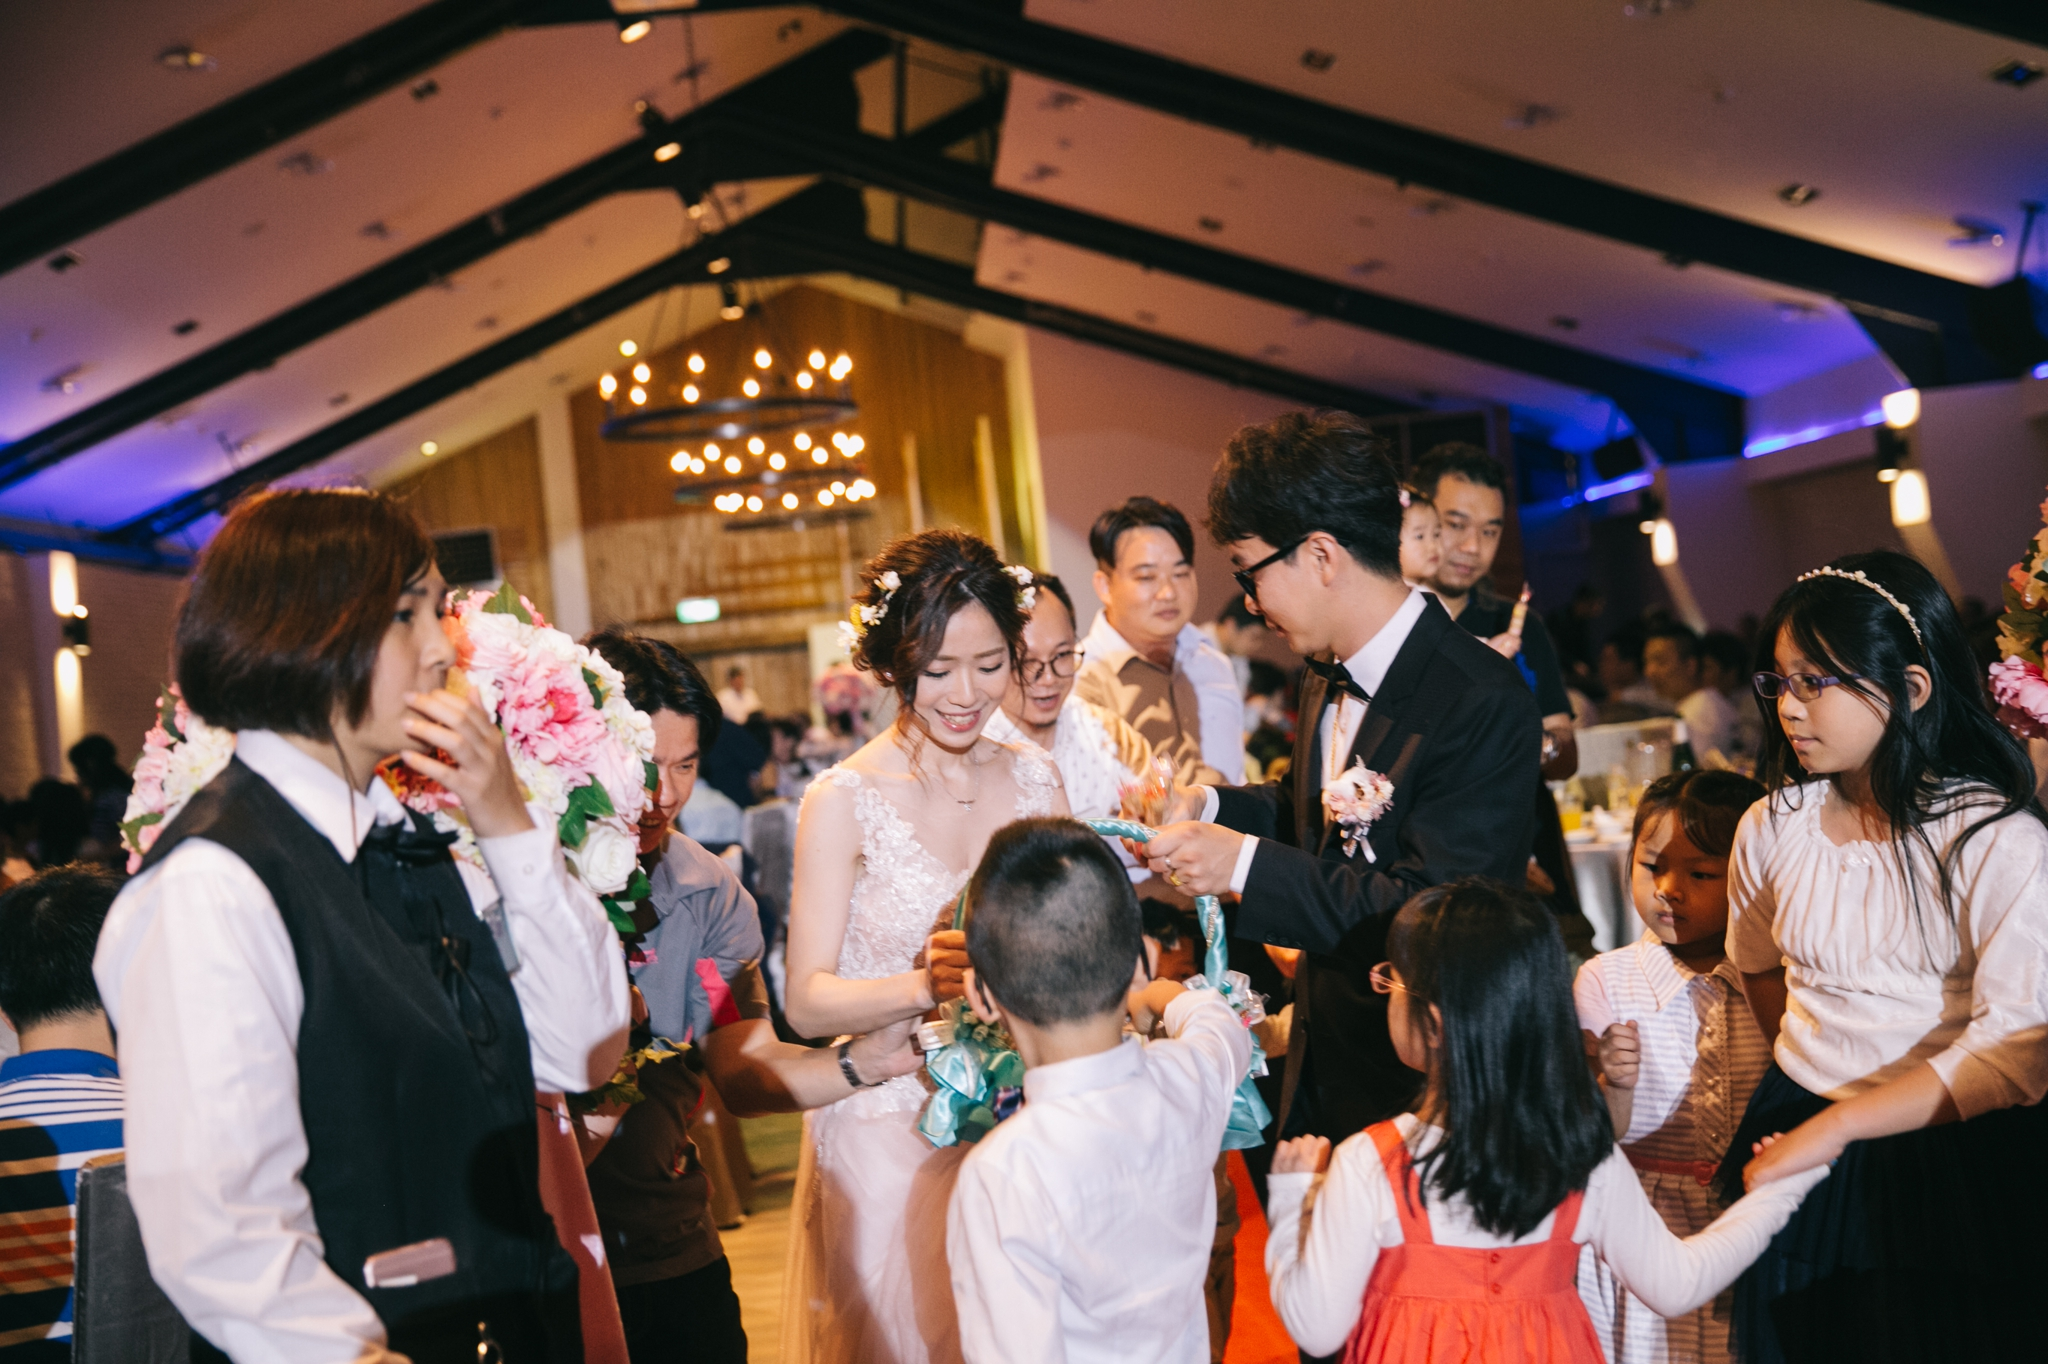 Tina+Nash-wedding-台北婚禮迎娶晚宴-新莊終身大事-137.jpg